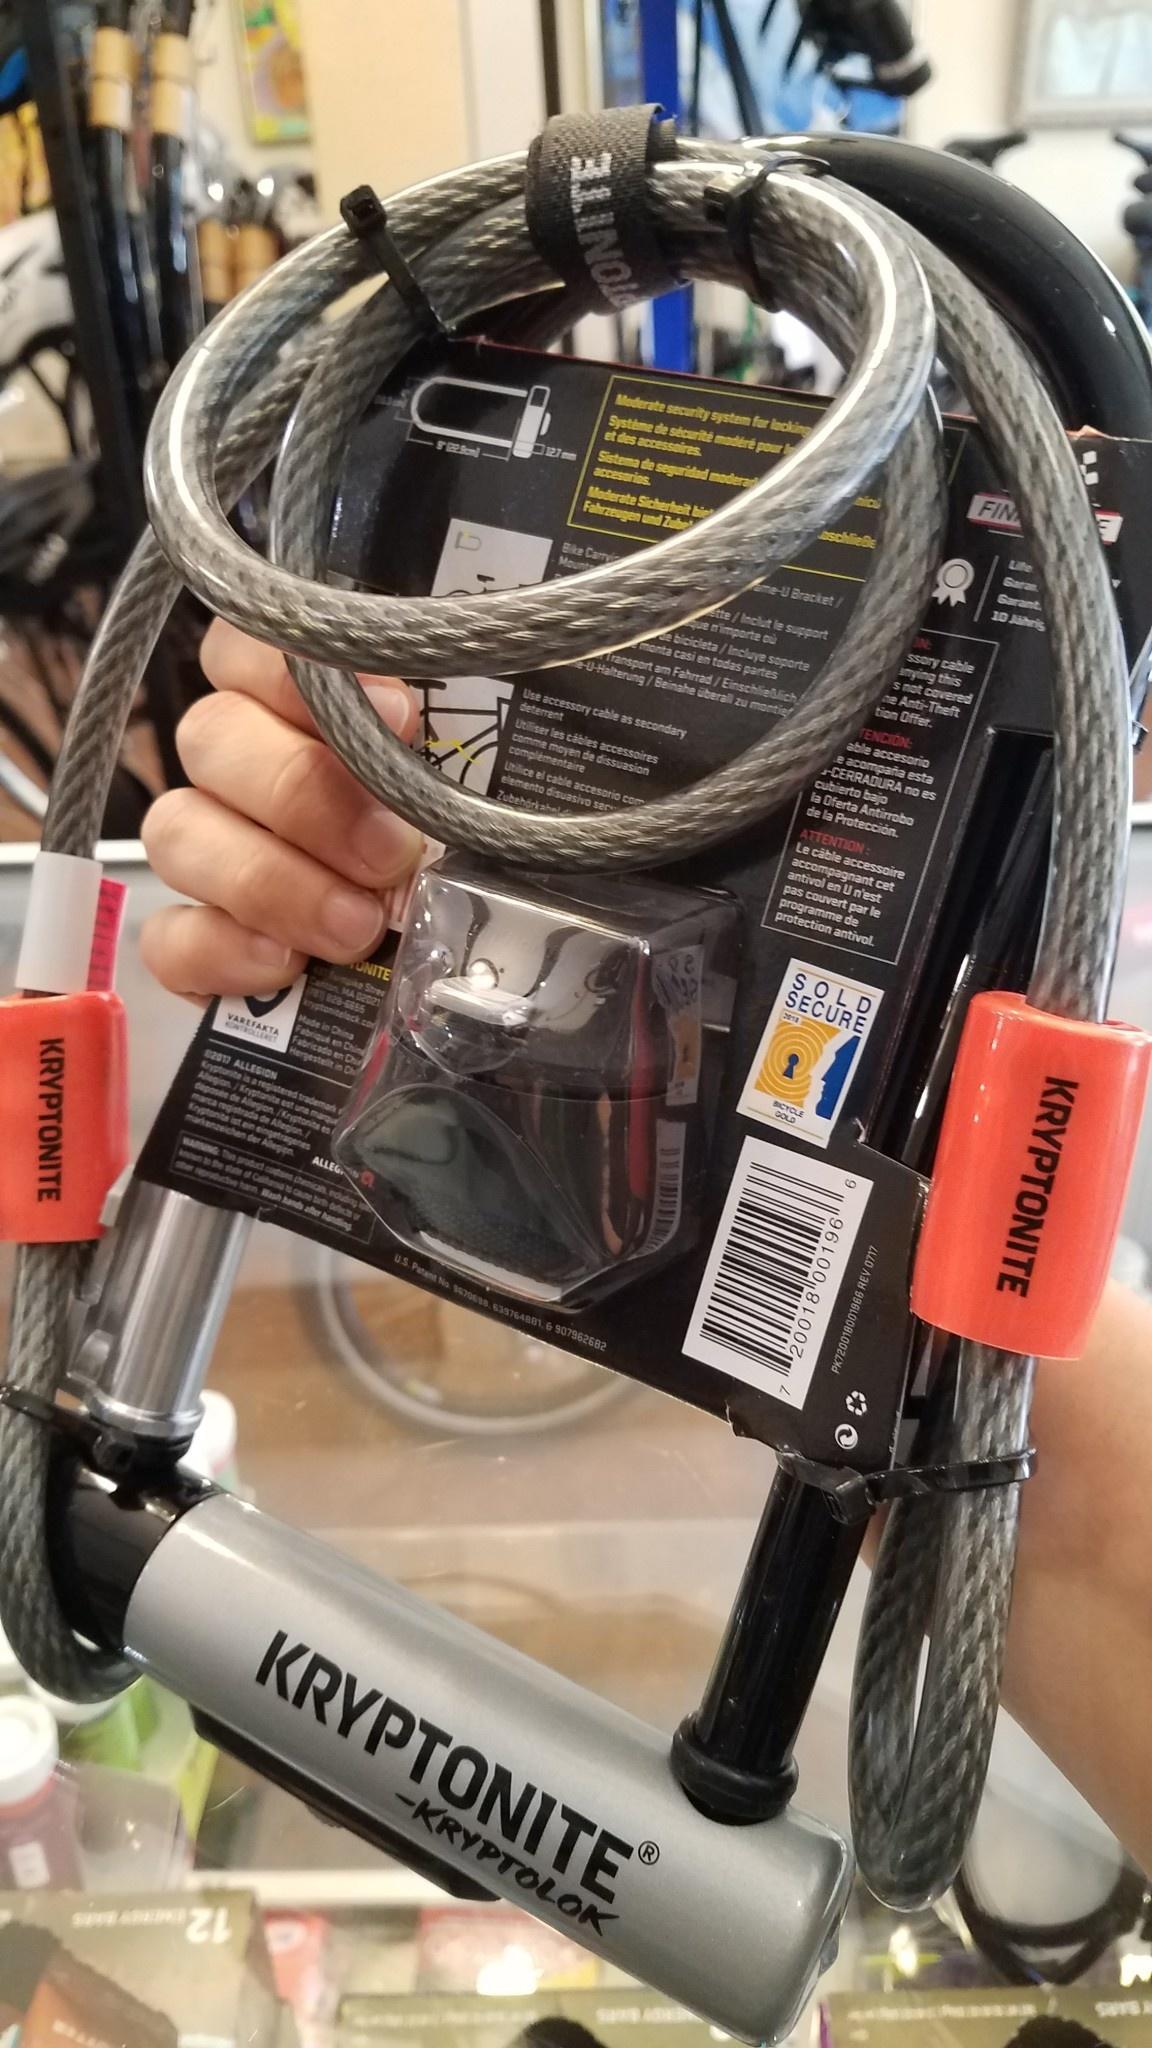 Kryptonite KryptoLok STD U-Lock with 4' Flex Cable and Bracket (6/10 safety)